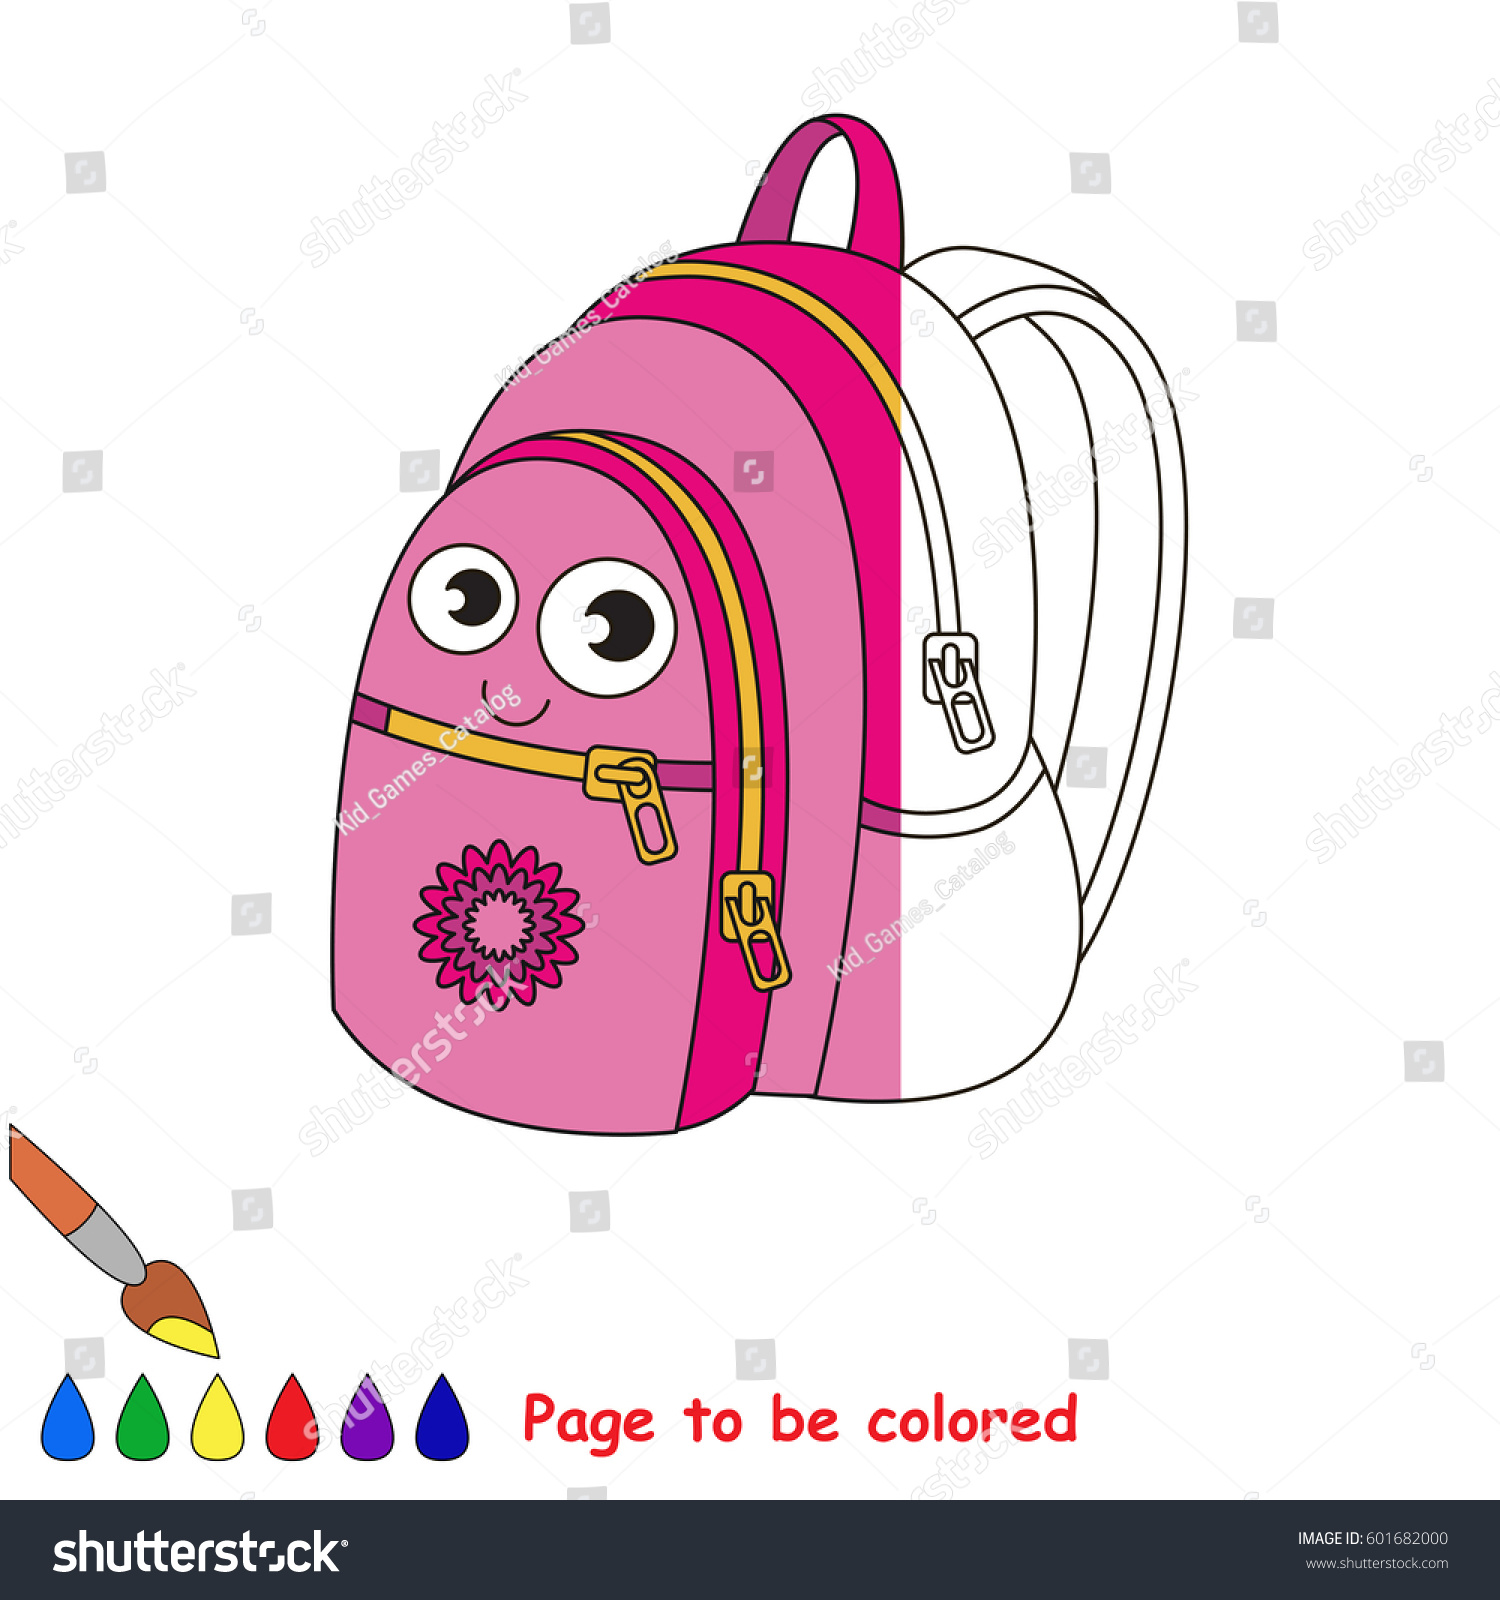 Cute School Bag Coloring Book Educate Stock Vector (Royalty Free ...